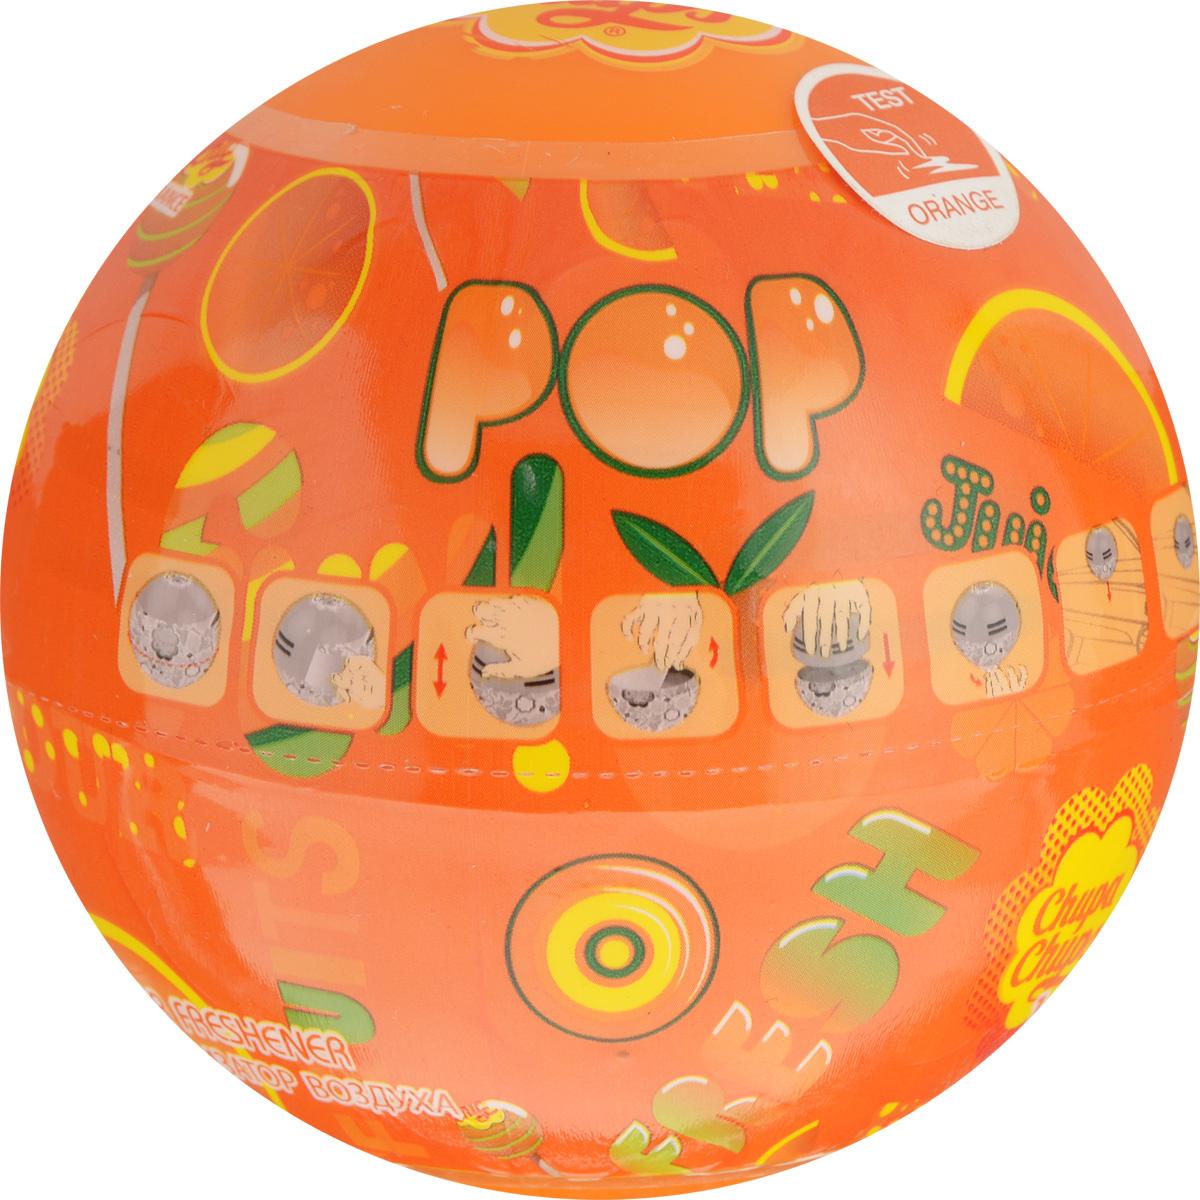 Ароматизатор воздуха Autoprofi Chupa Chups, с ароматом апельсина, на панель приборов, гелевый, 100 мл ароматизатор воздуха chupa chups ваниль подвесной флакон 5 мл